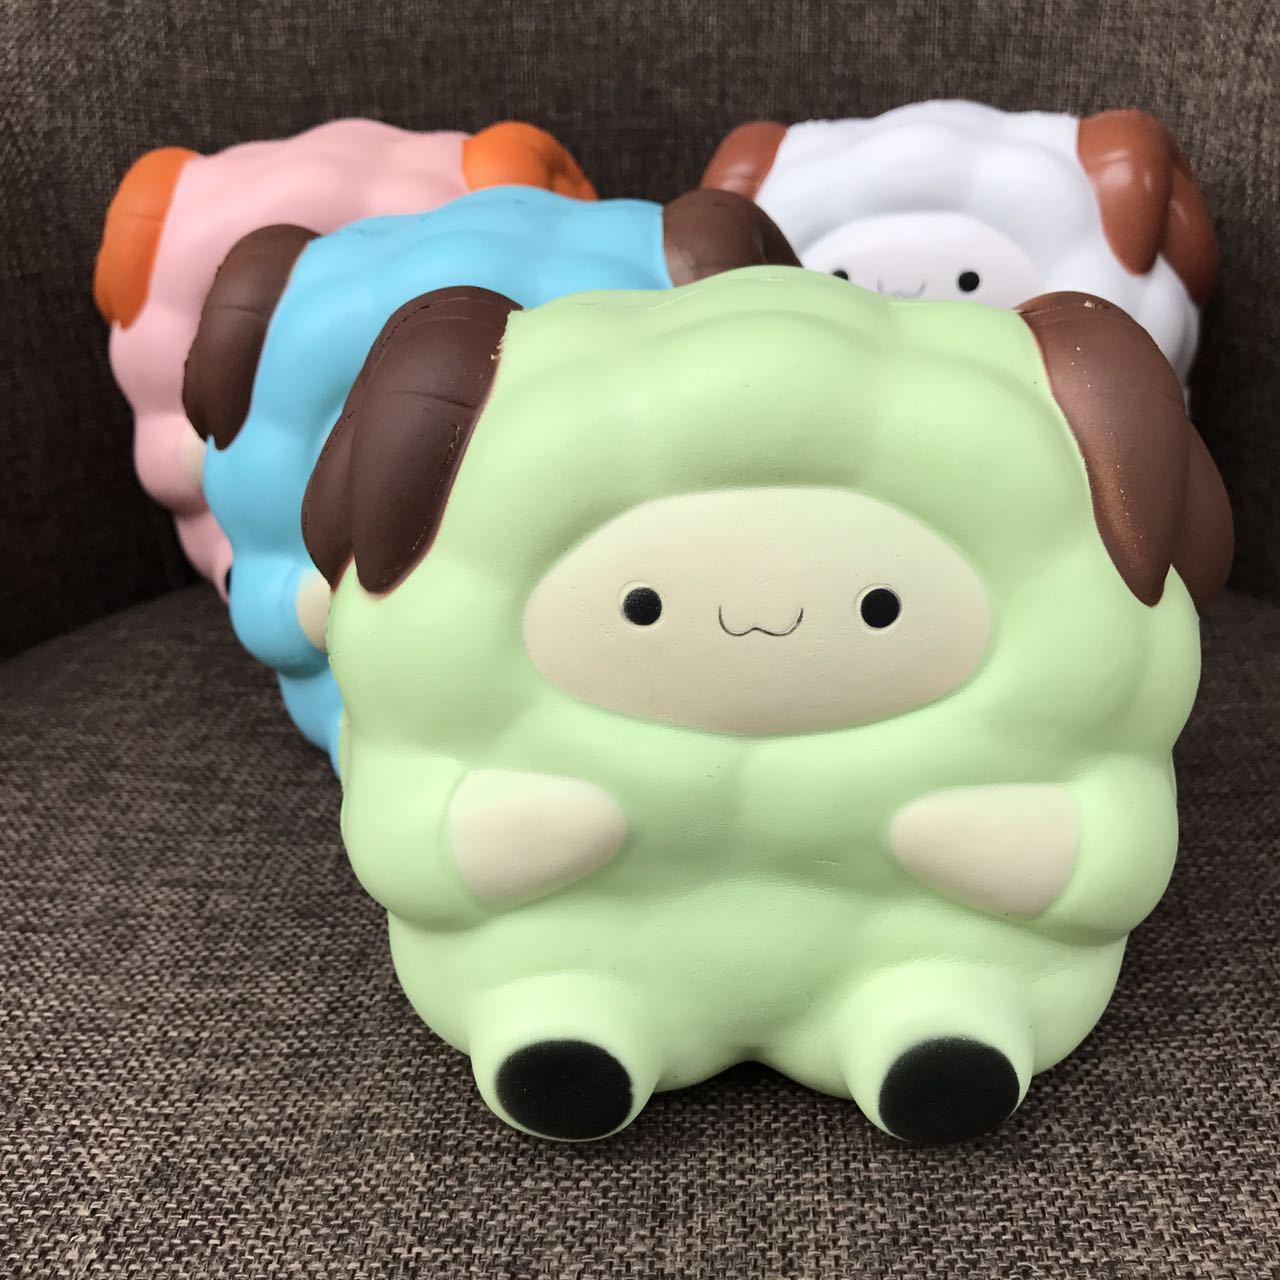 Jumbo Cartoon Big Sheep Squishy 13.5CM Slow Rising Squeeze Stress Reliever Toy Cake Bread Fun Toy Kid Birthday Christmas Gift P2